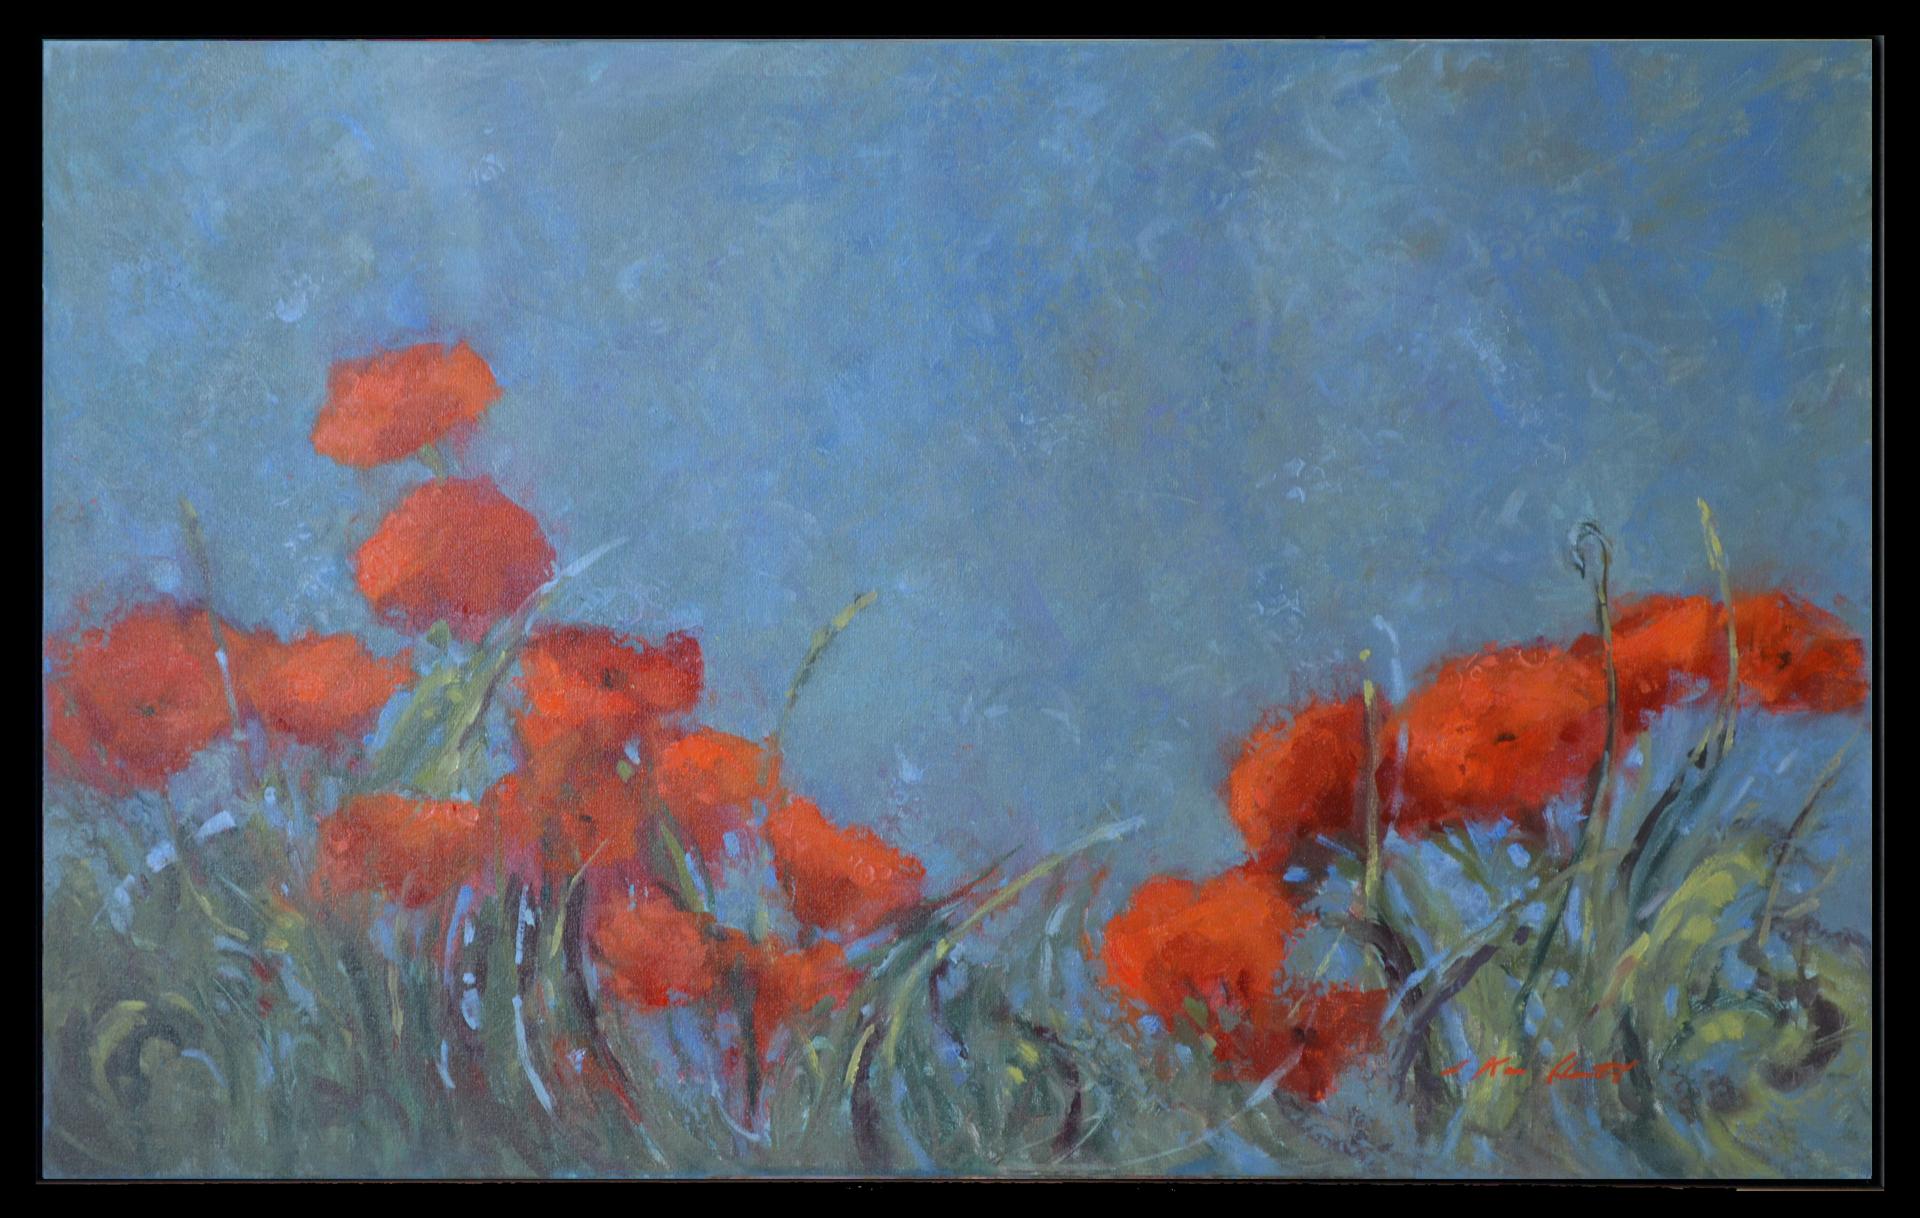 Blue Monday by Karen Hewitt Hagan